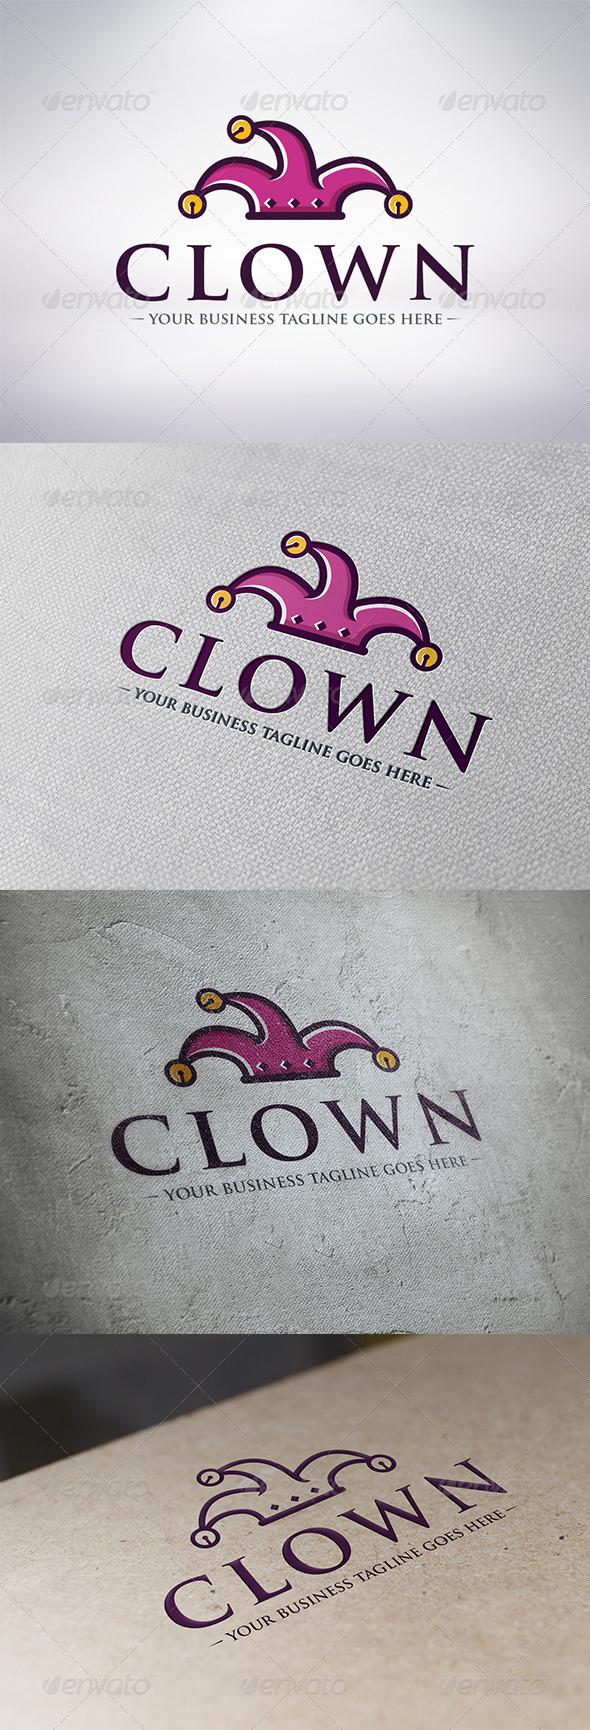 GraphicRiver Clown Logo Template 6322242